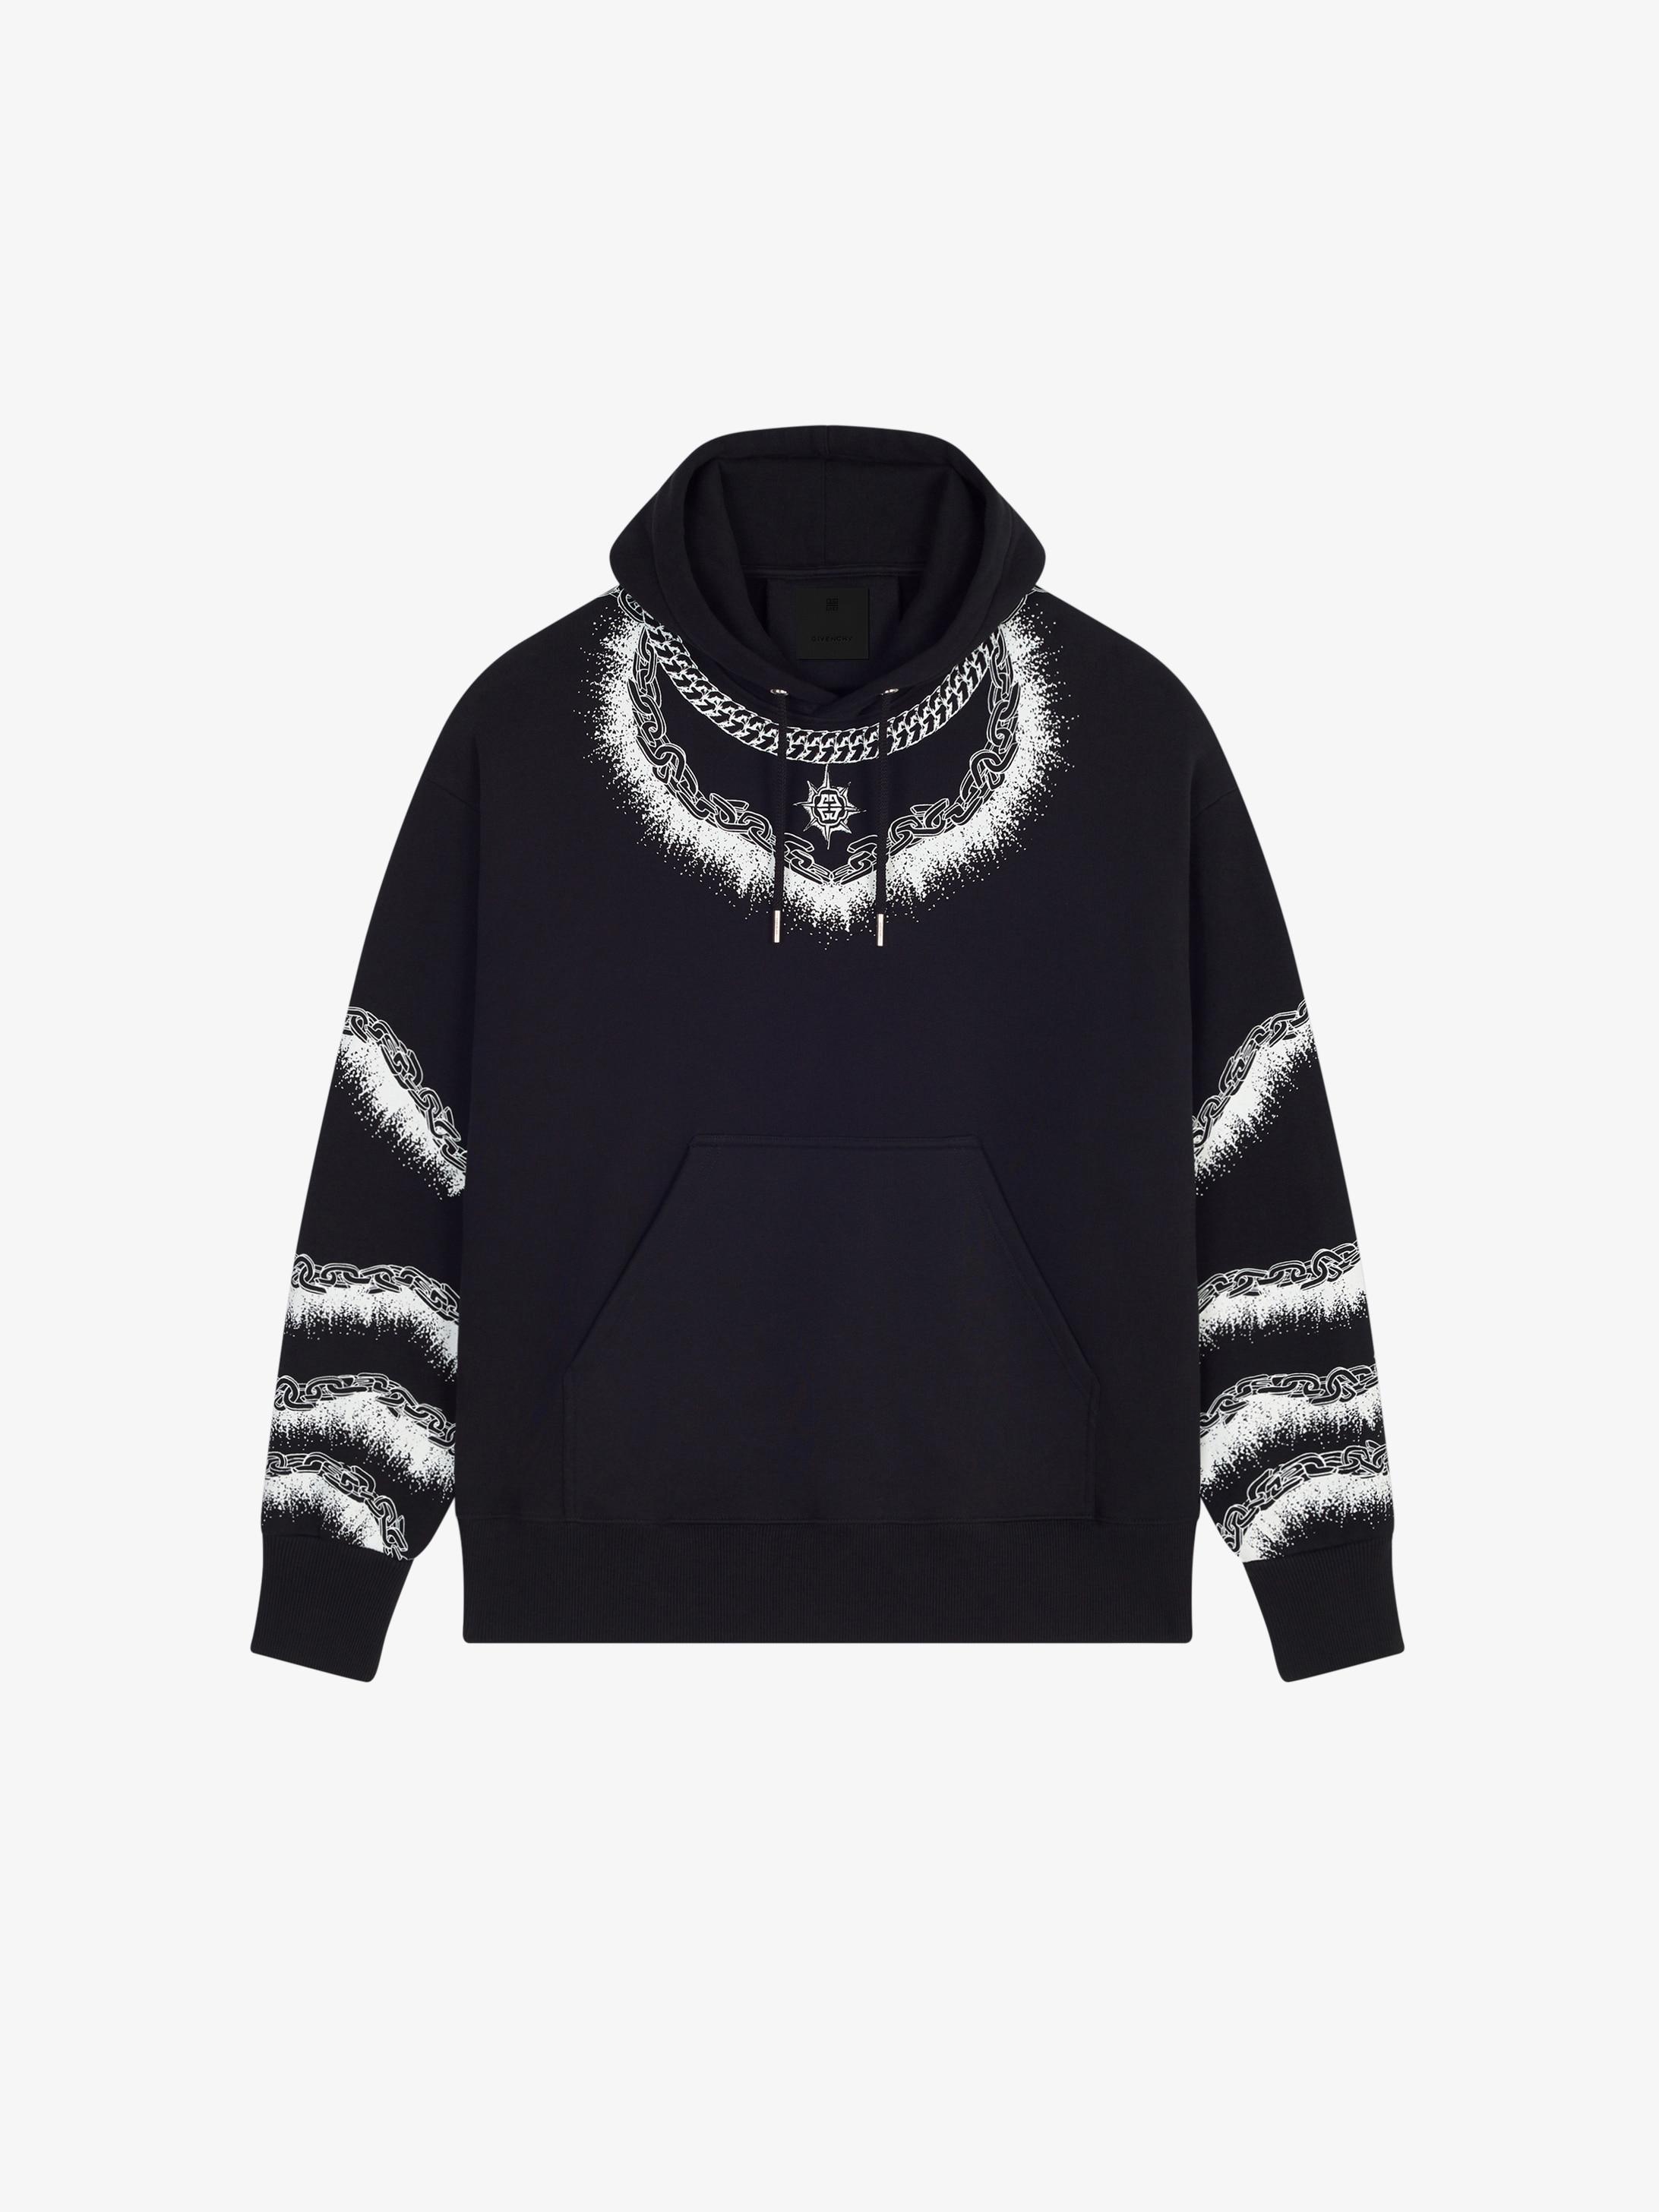 Oversized chain printed hoodie